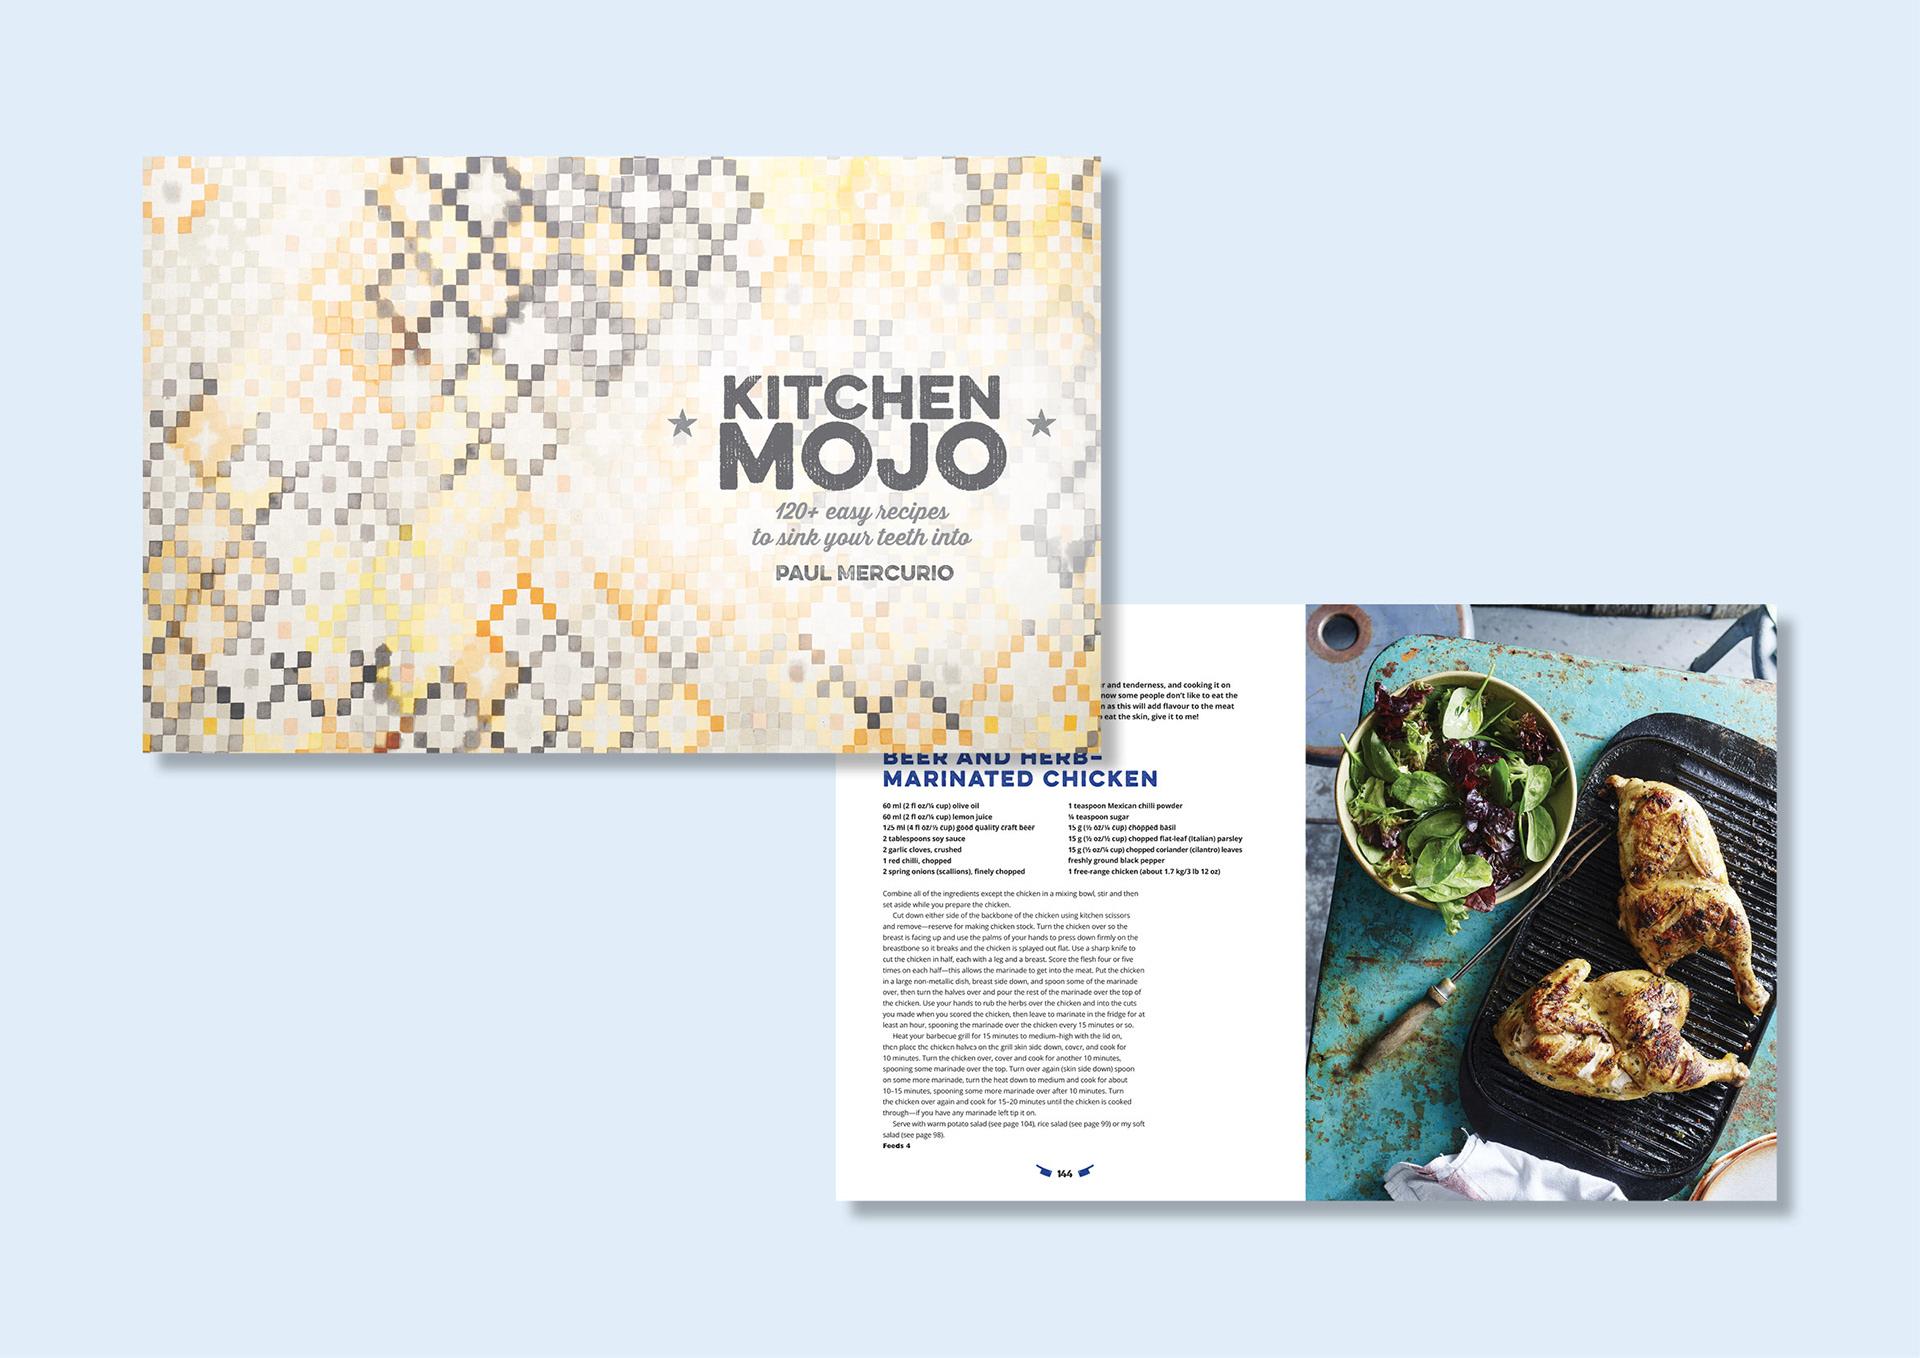 Justin Thomas Design - Paul Mercurio - Kitchen Mojo Cookbook